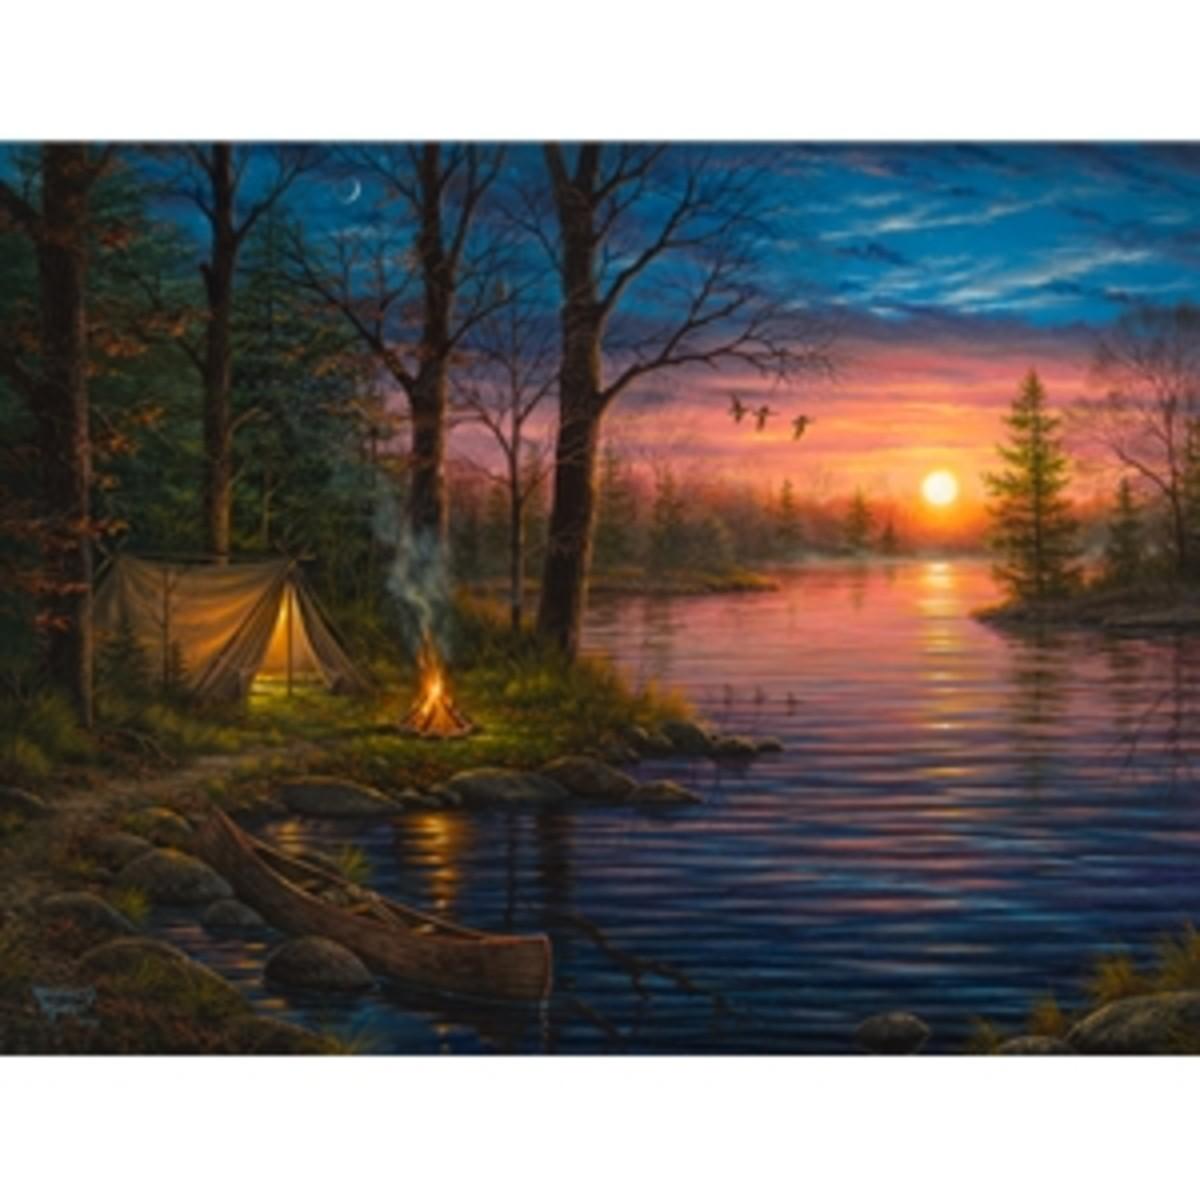 Abraham Hunter's Brilliant use of Light